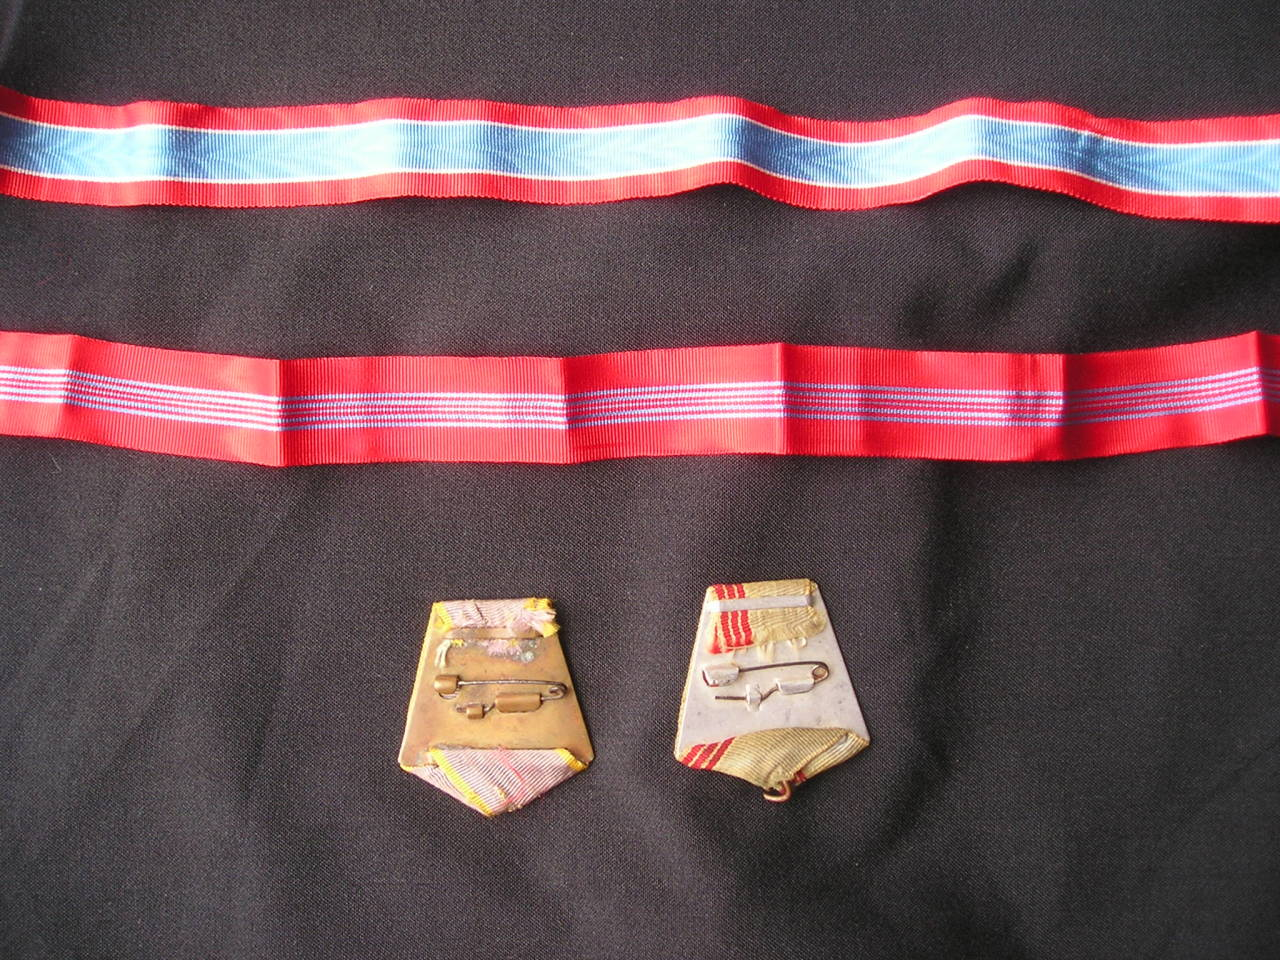 USSR ribbons